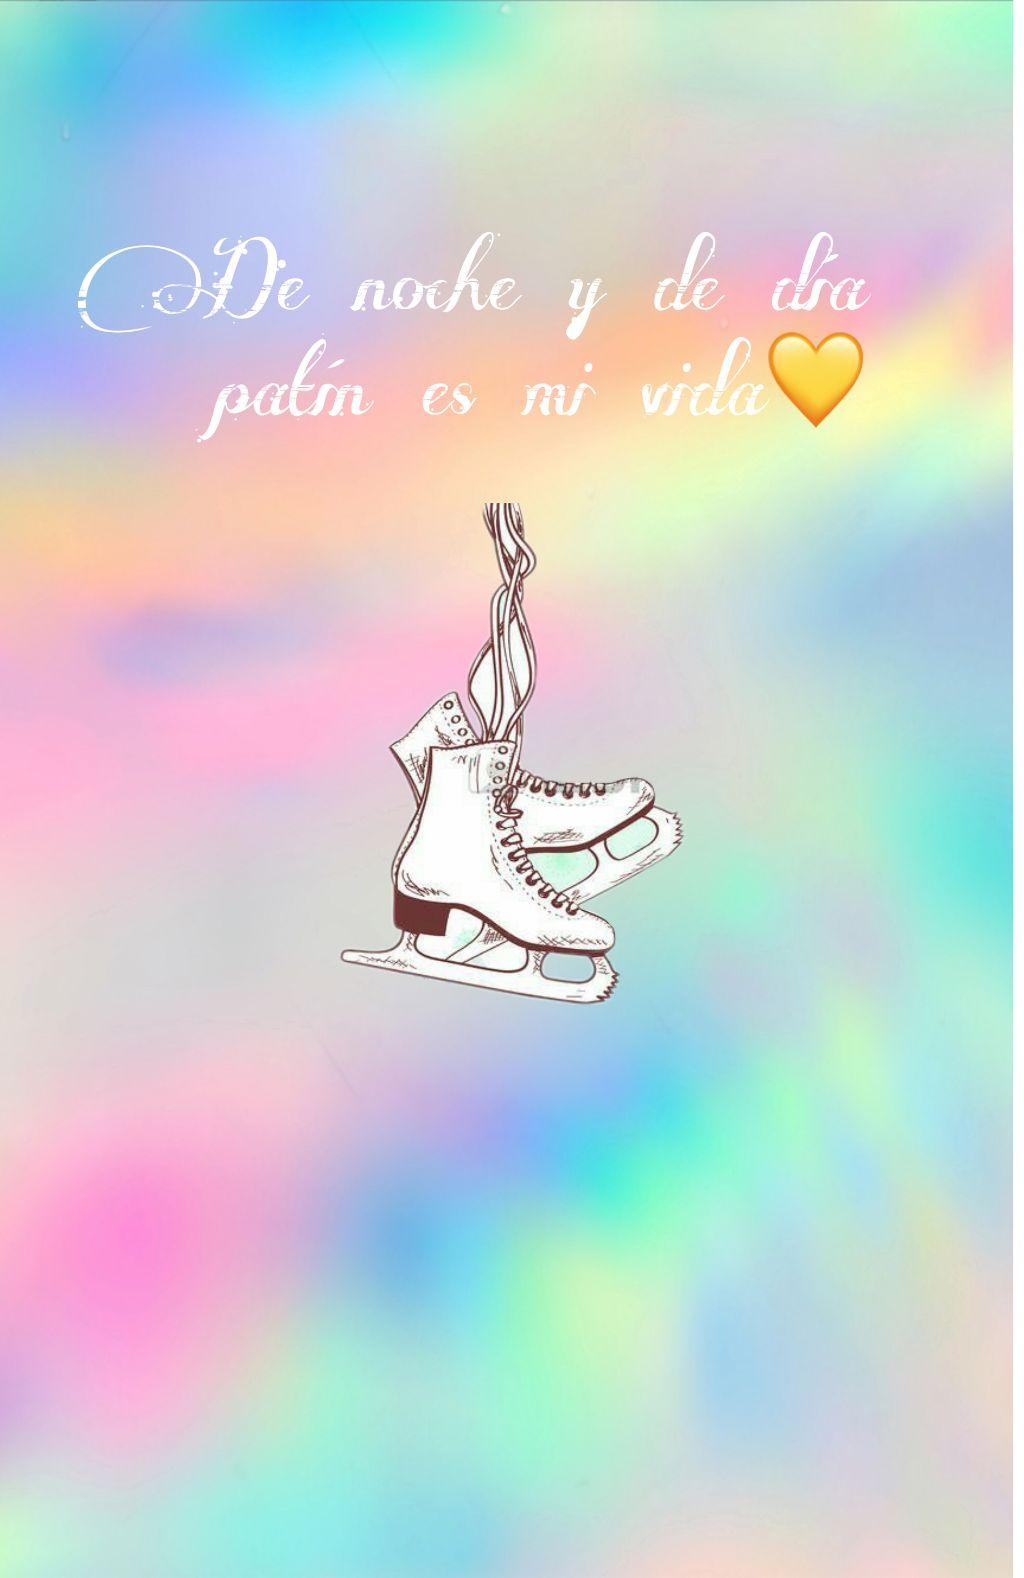 #freetoedit #patines #patinaje #france #italy #california